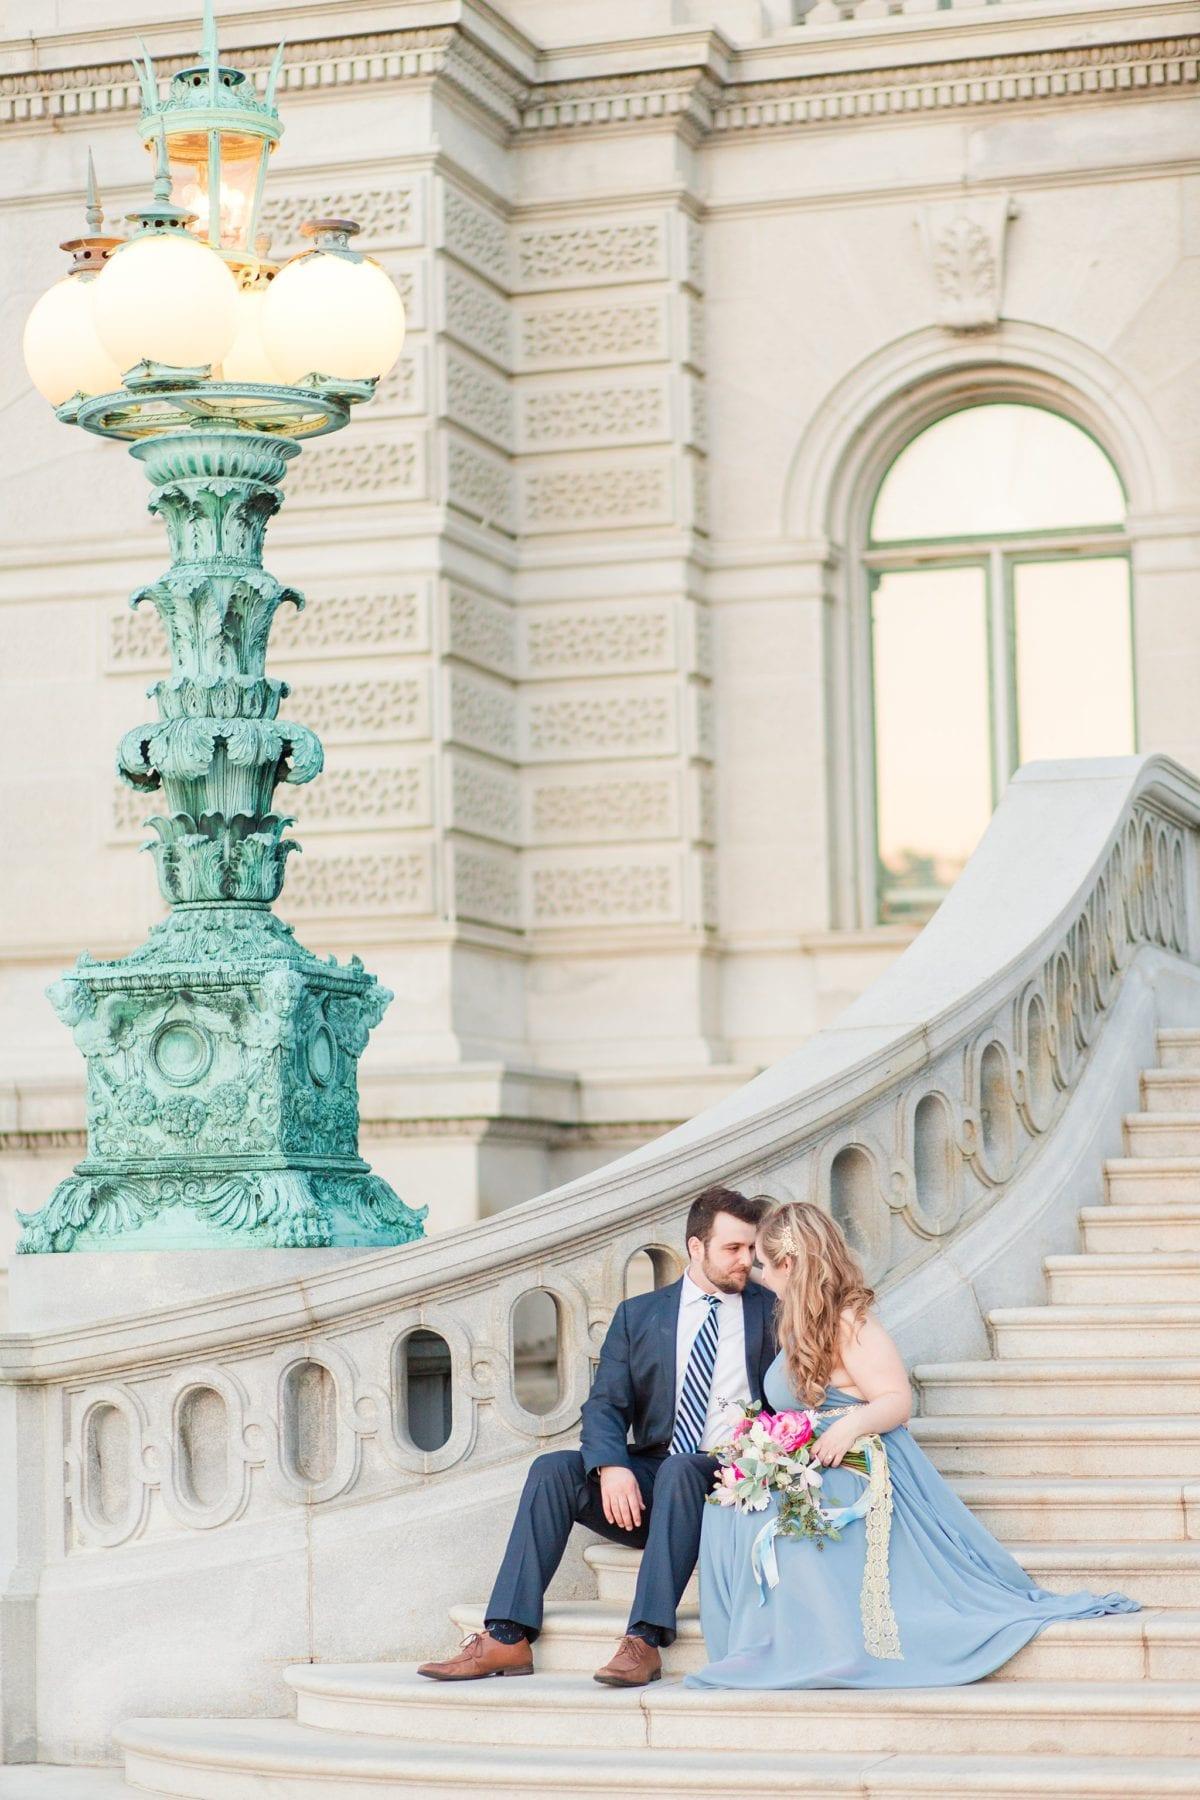 Capitol Hill Engagement Photos Kelly & Zach Washington DC Wedding Photographer Megan Kelsey Photography-338.jpg